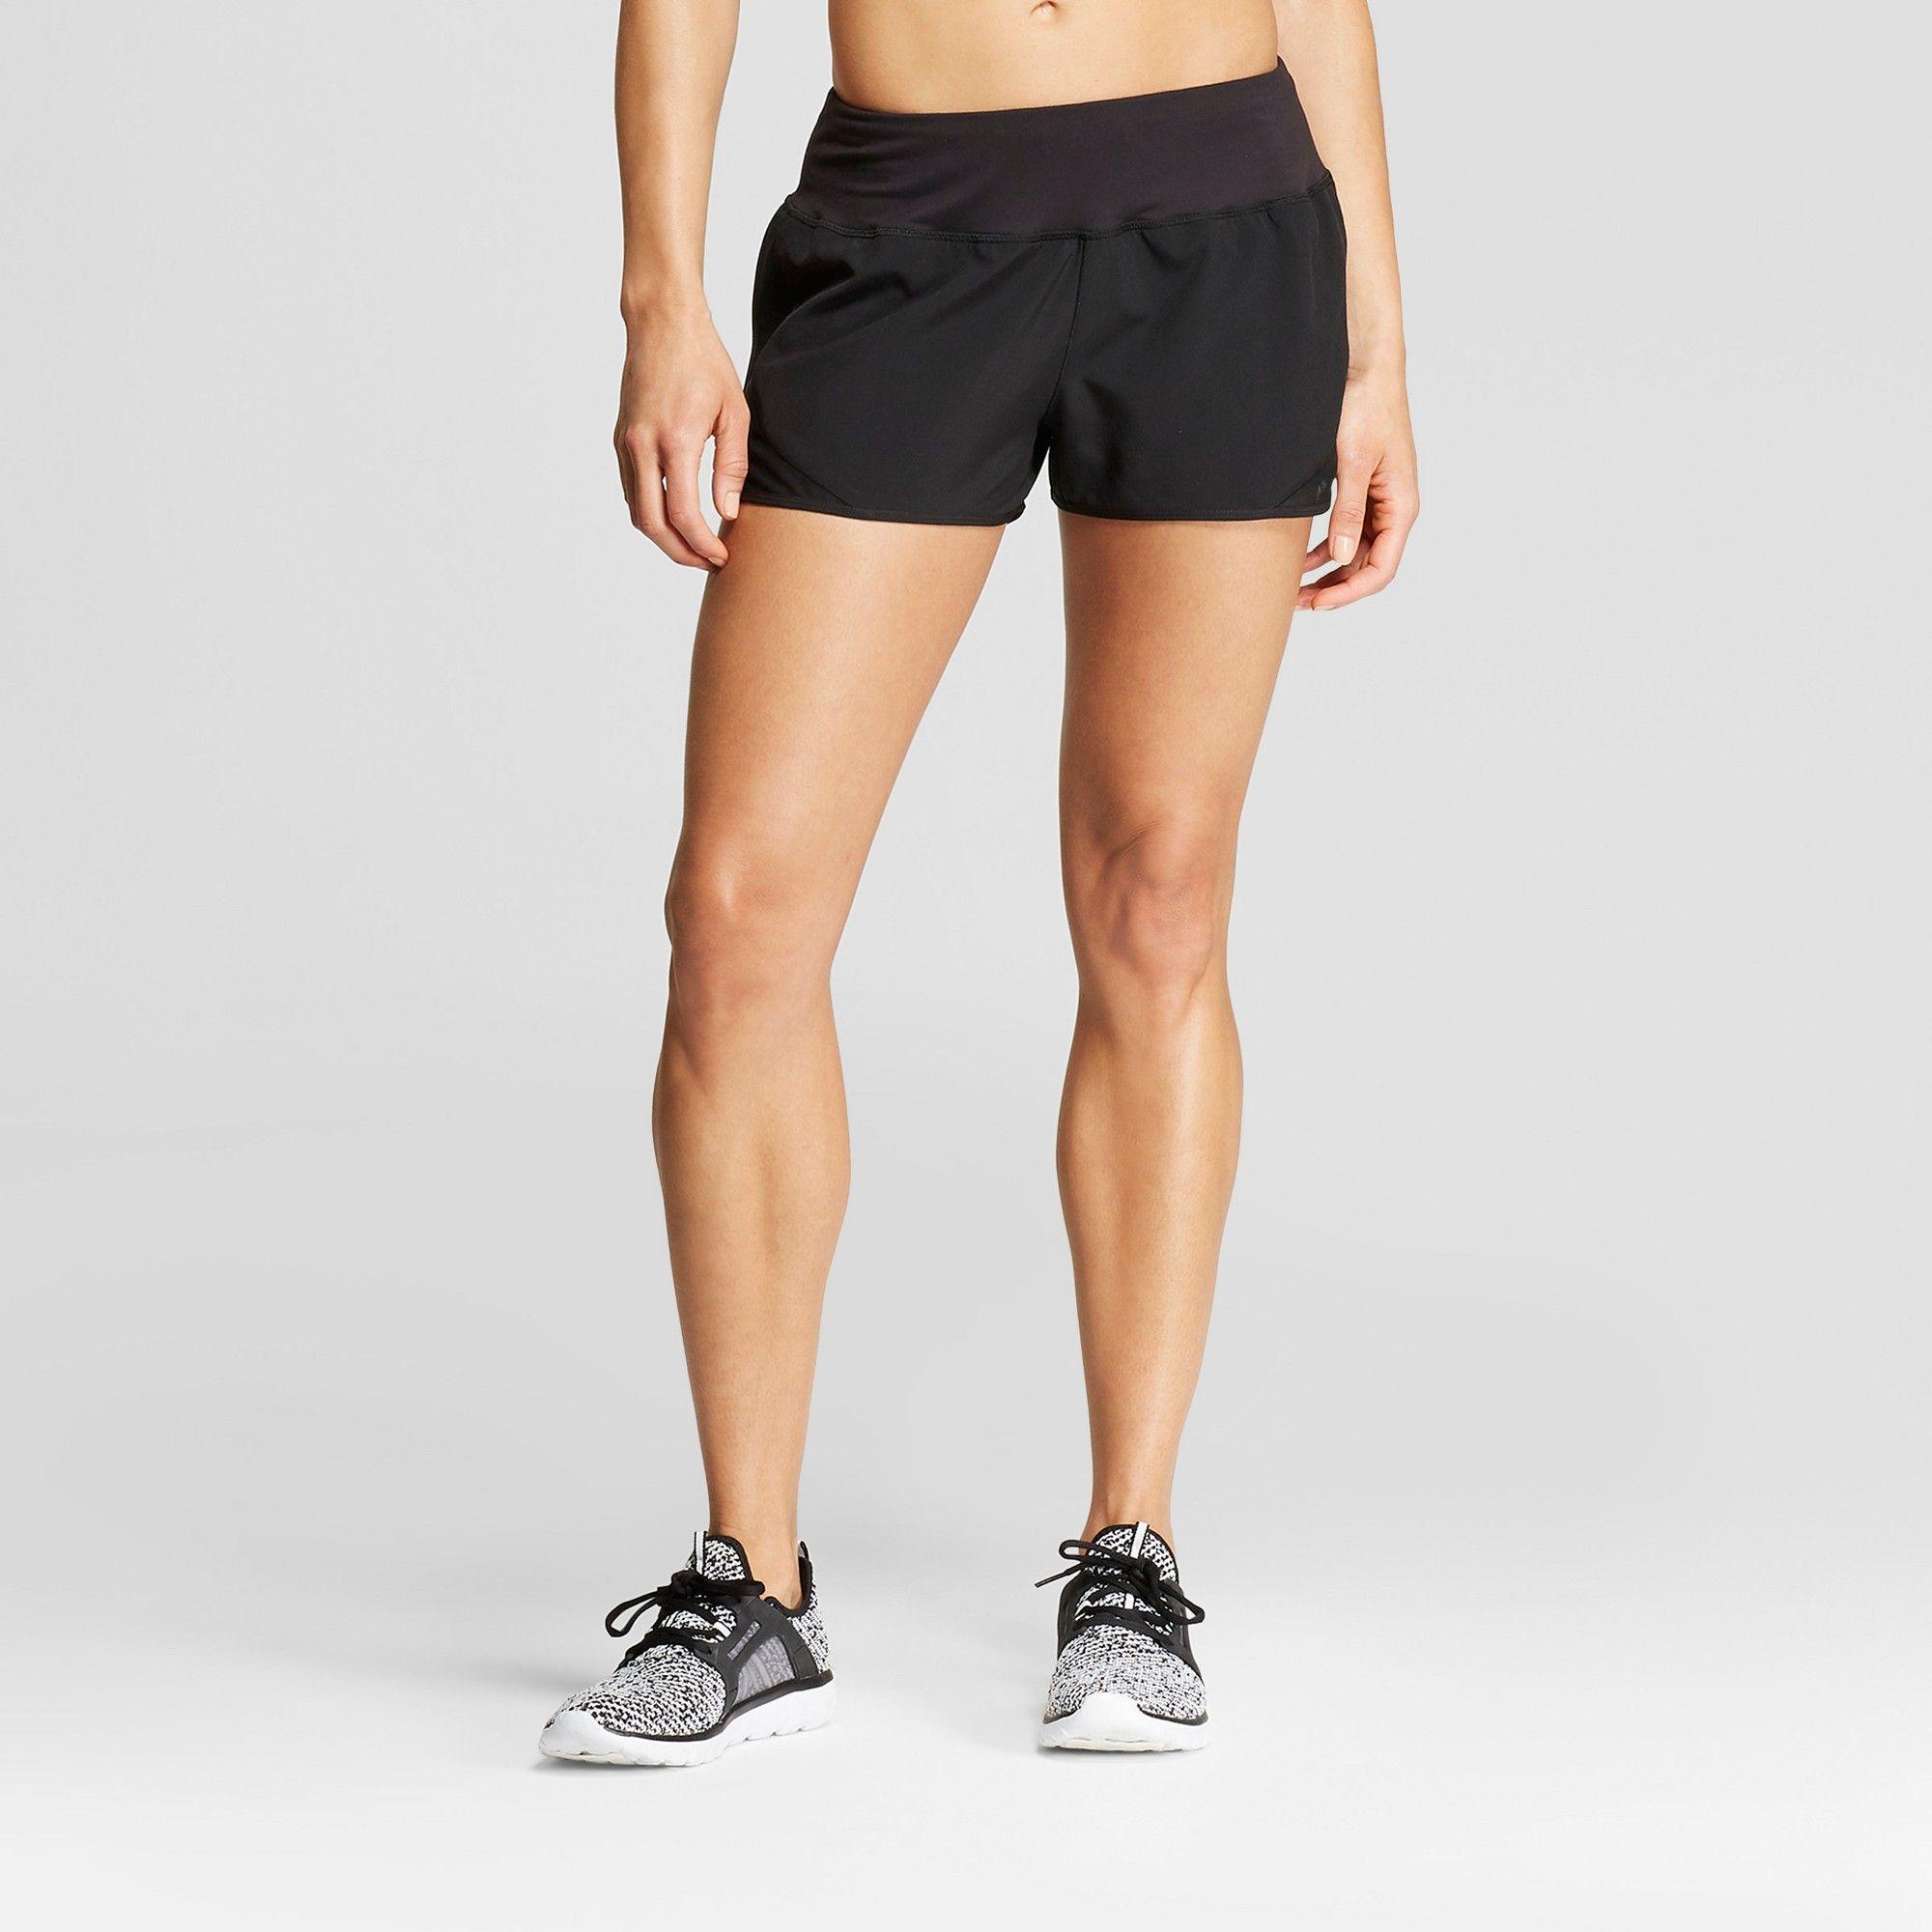 319f03c4c0a5 Women s Premium Run Shorts - C9 Champion Black Xxl